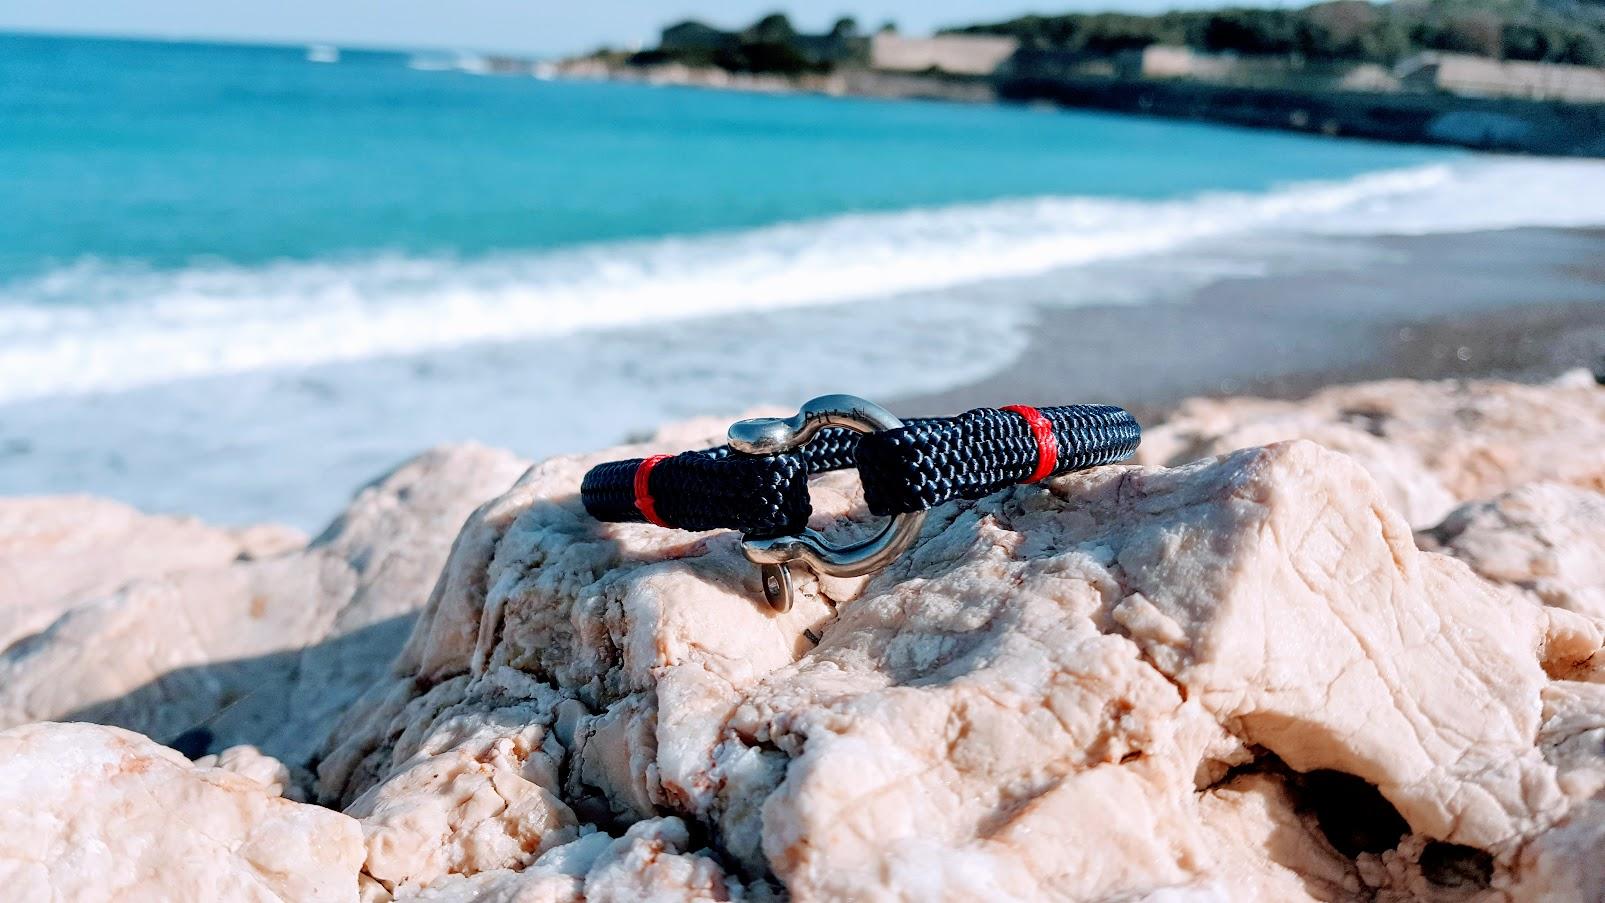 modèle Frenchies bracelet marin made in france cordage bleu